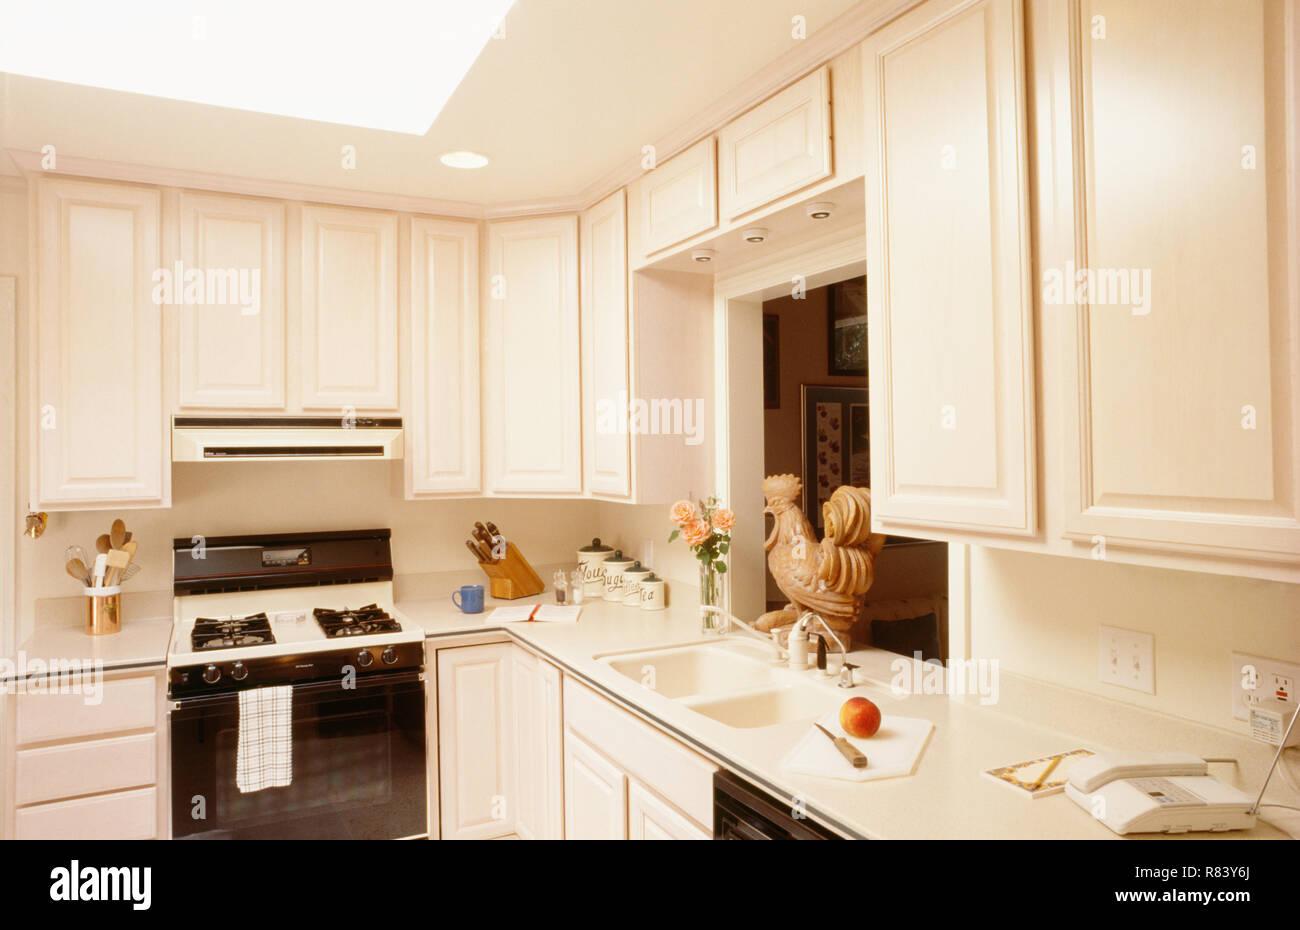 Kitchen Interior, USA - Stock Image